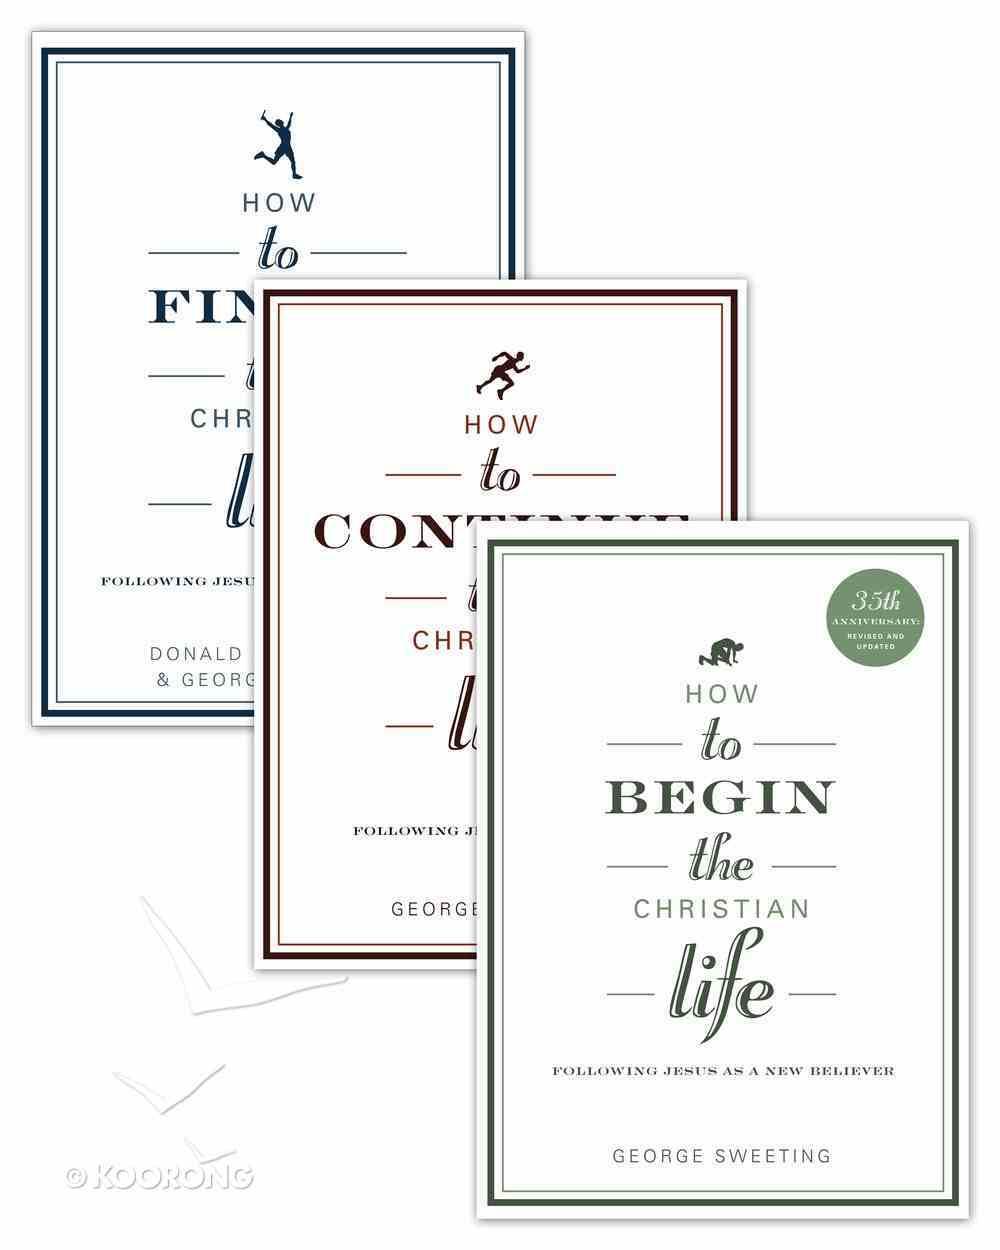 The Christian Life (Set Of 3 Books) eBook